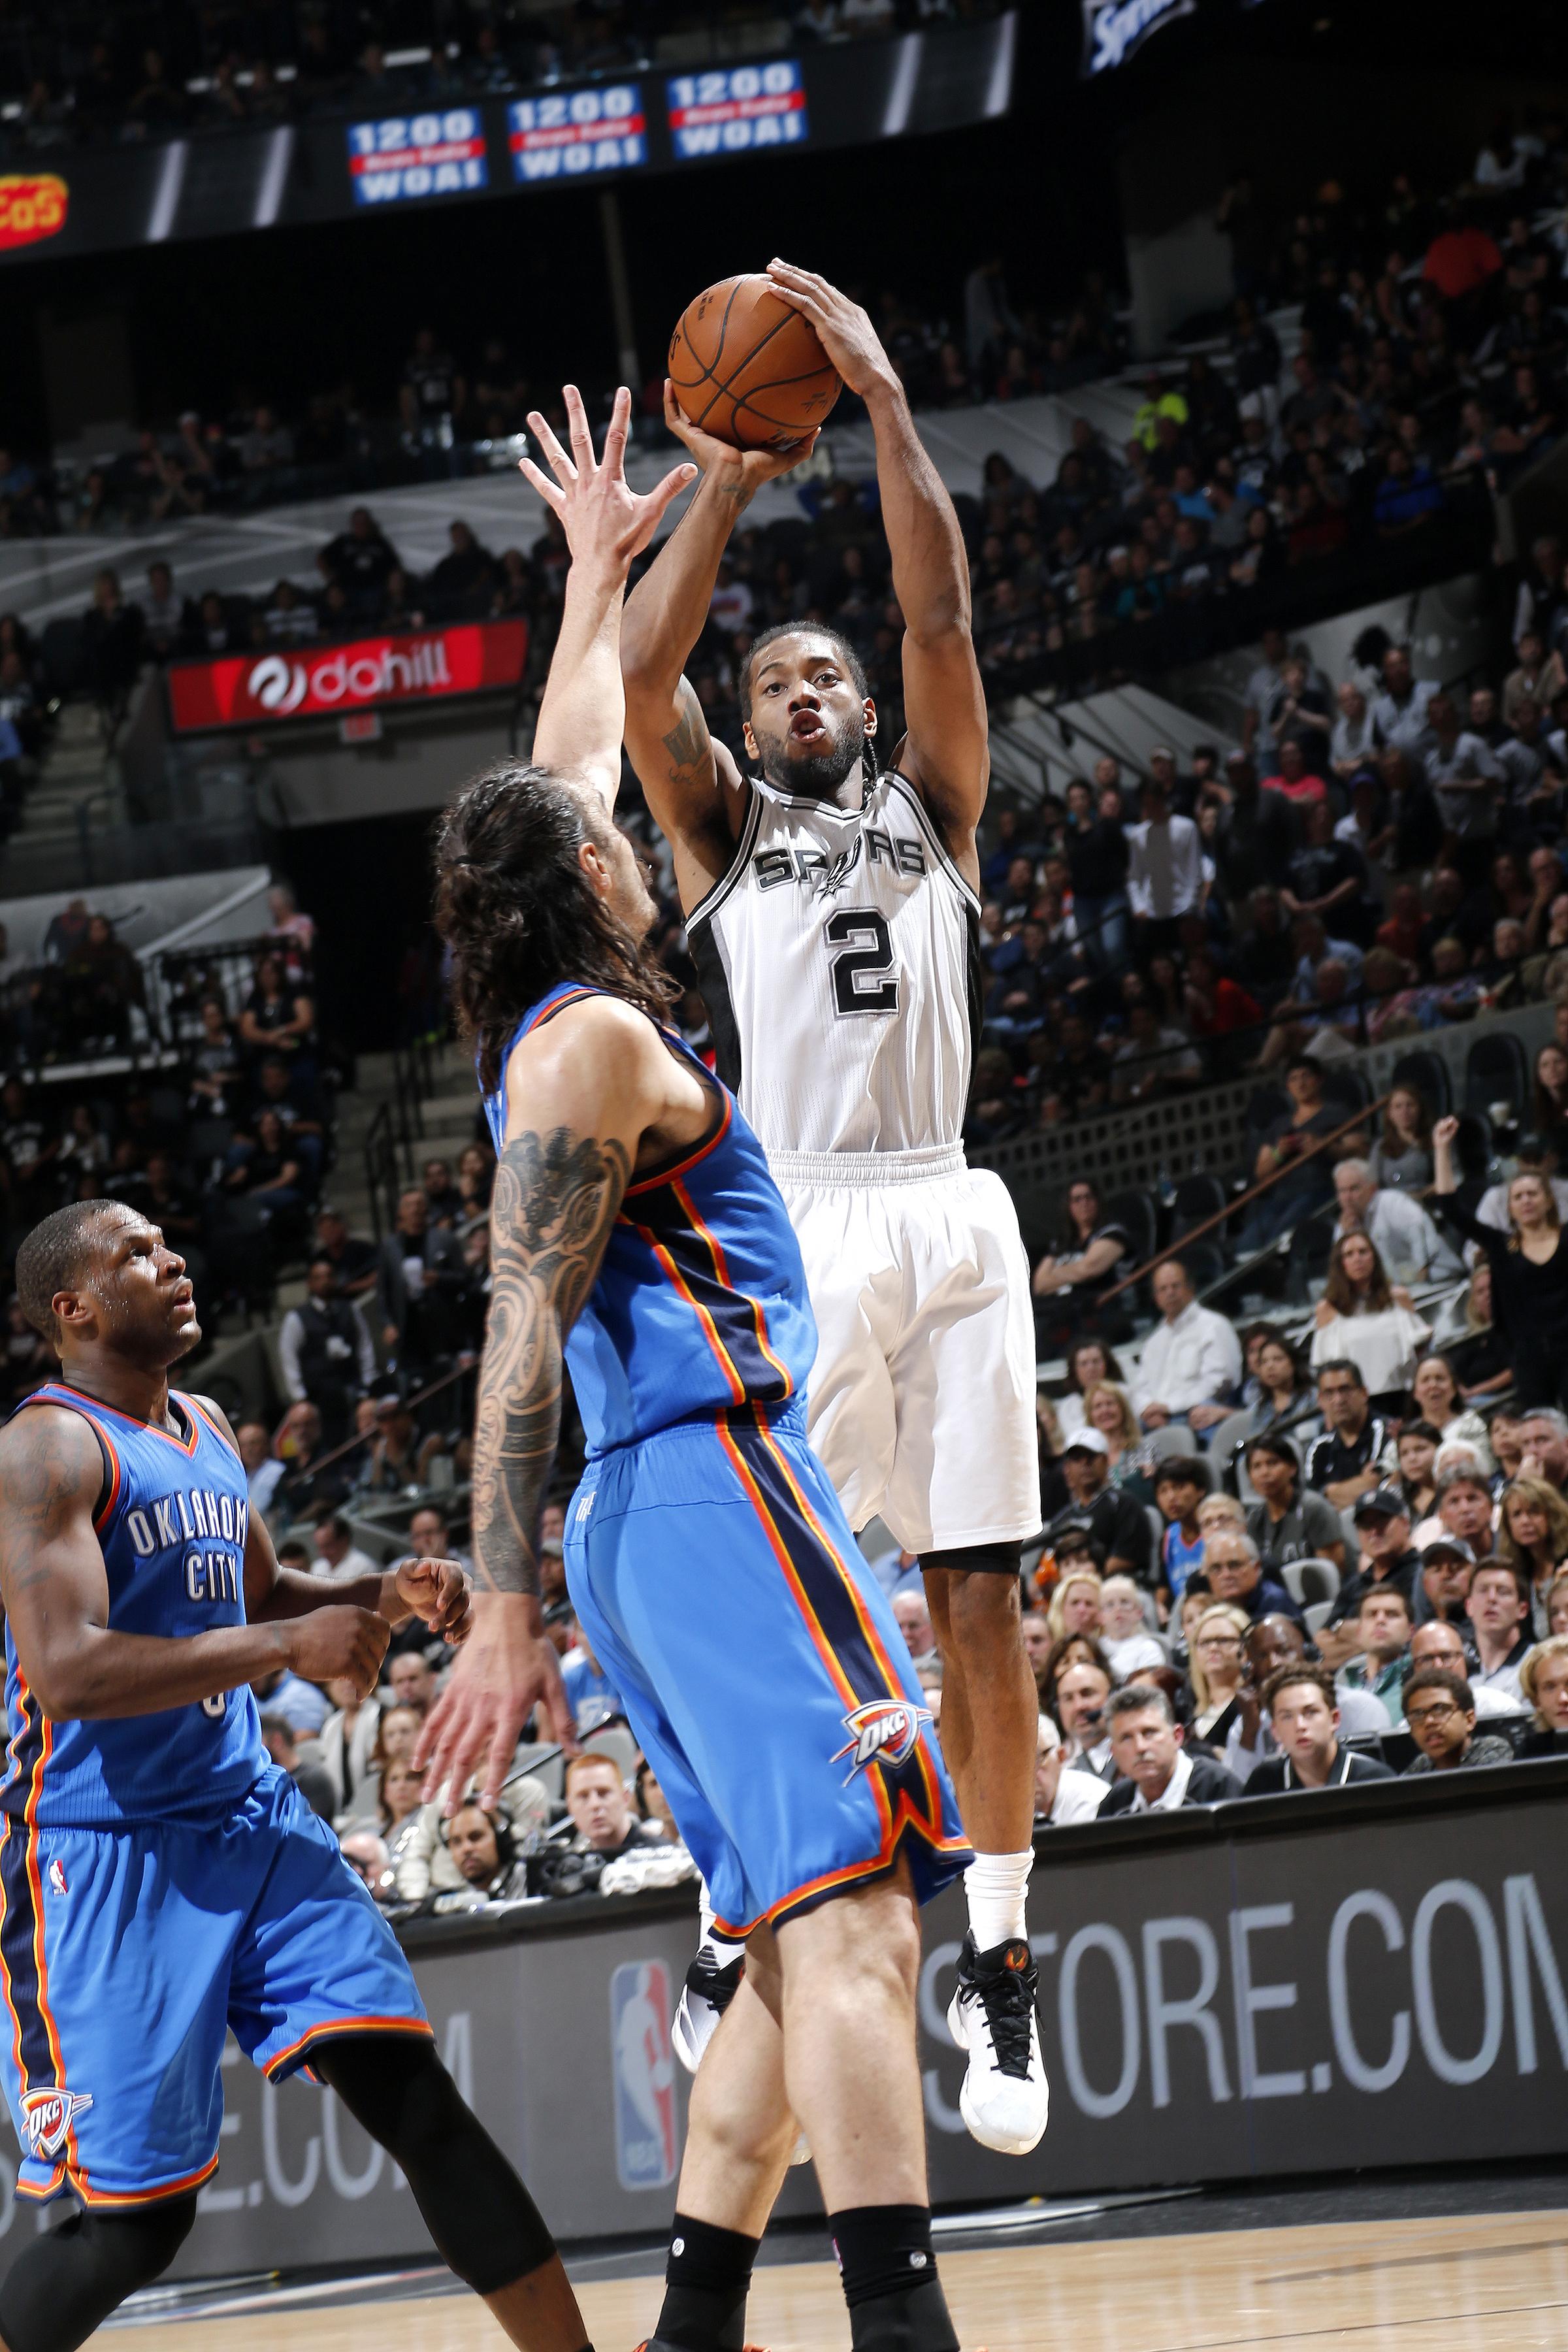 SAN ANTONIO, TX - APRIL 12: Kawhi Leonard #2 of the San Antonio Spurs shoots the ball during the game against the Oklahoma City Thunder on April 12, 2016 at the AT&T Center in San Antonio, Texas.